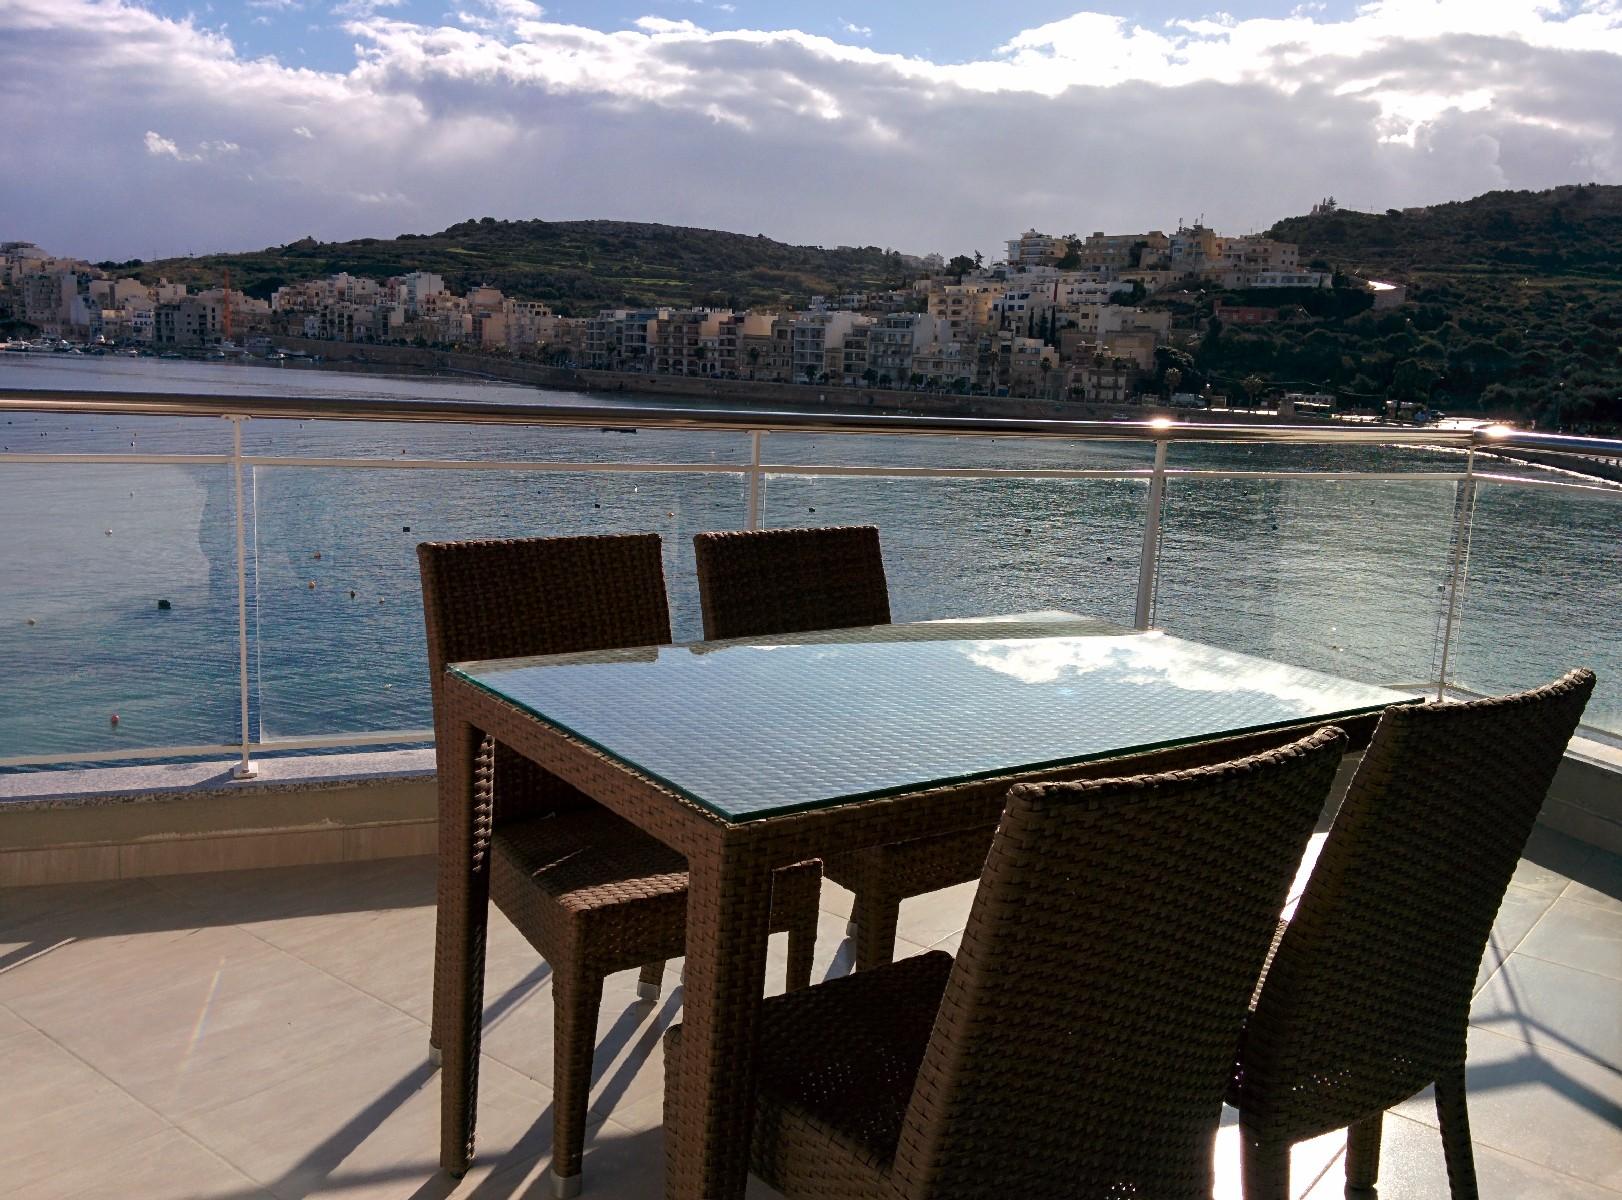 Malta Property for sale in Malta, Xemxija